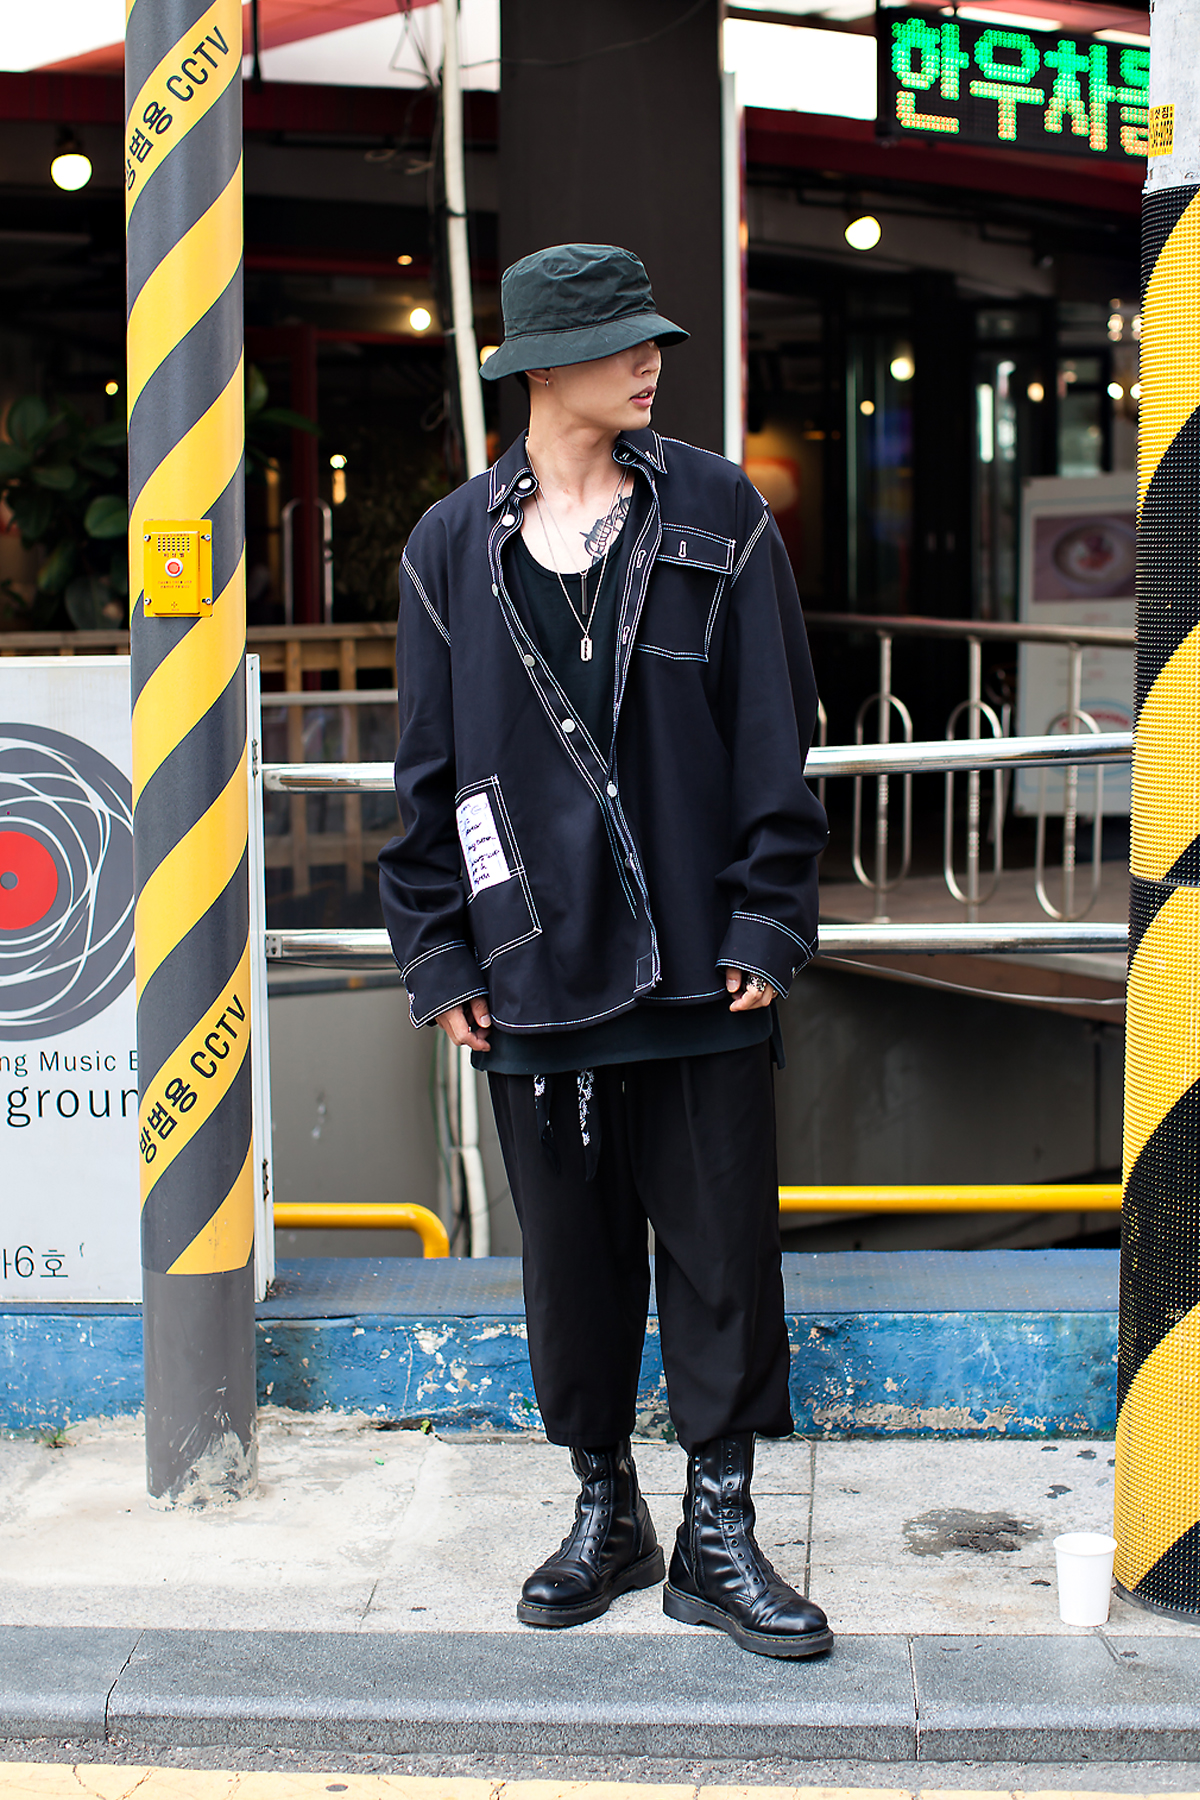 Kim Taesung, Street Fashion 2017 in Seoul.jpg